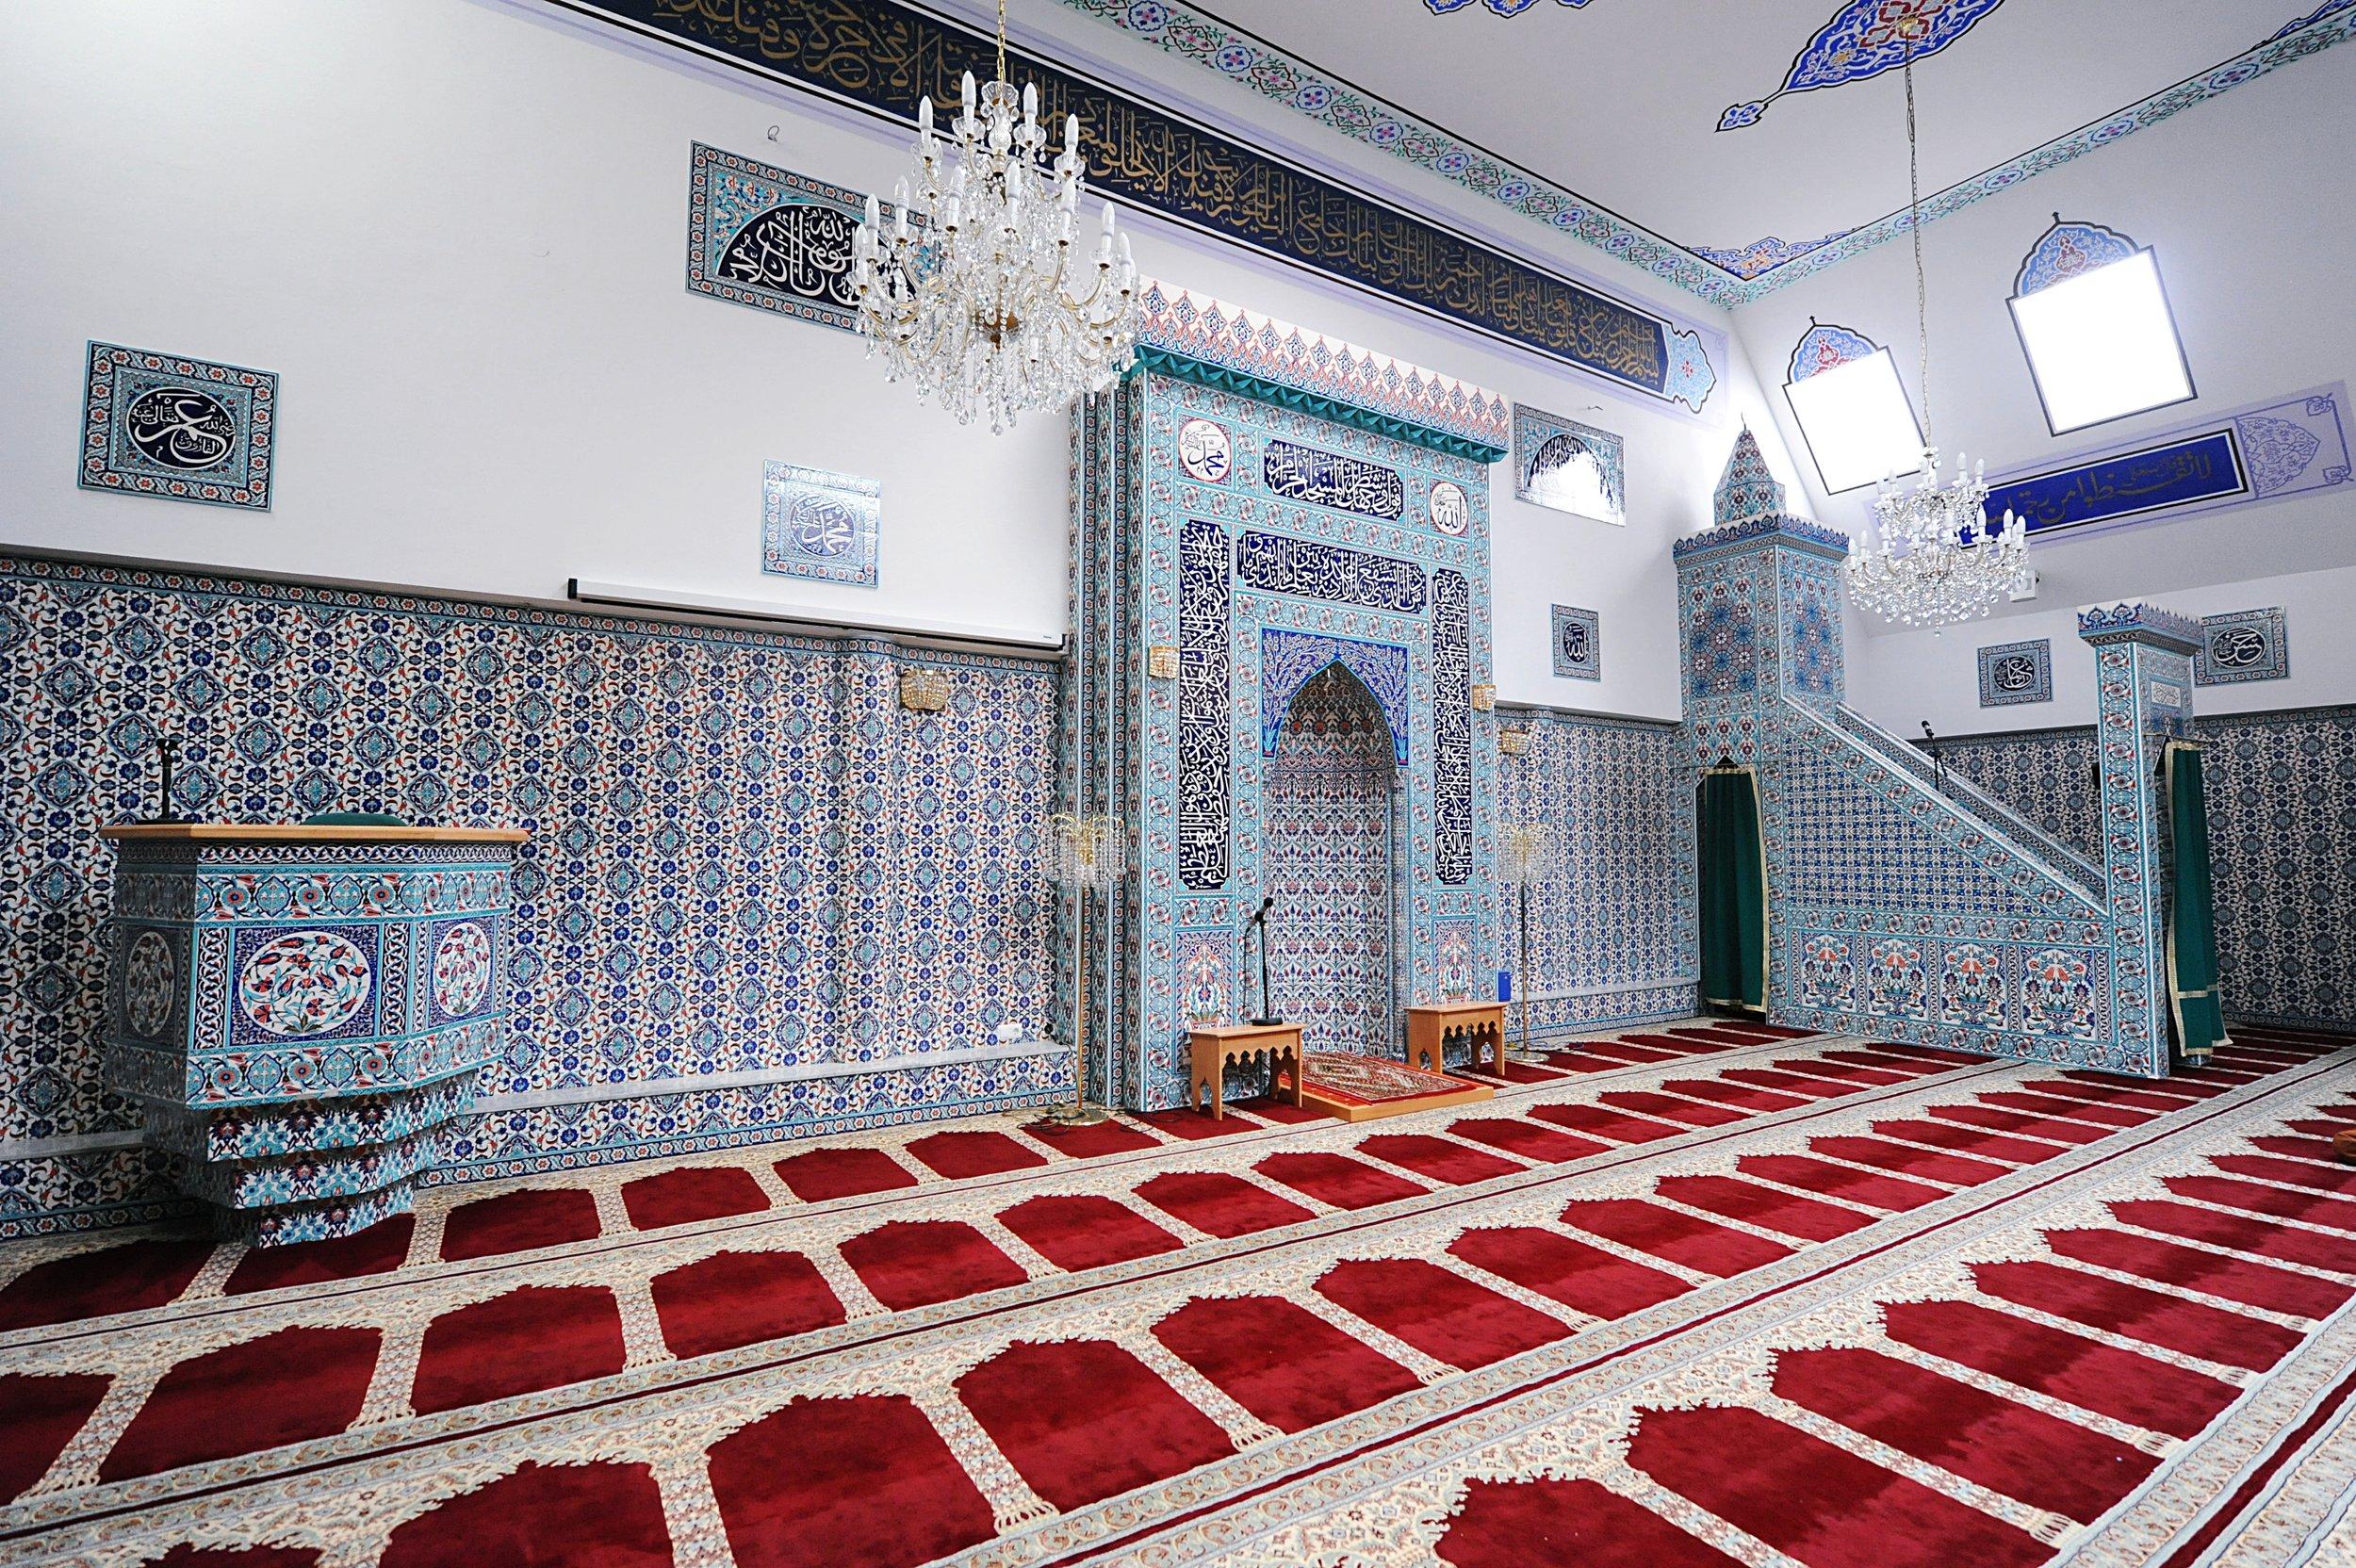 Moschee_Pelzgasse002.jpg